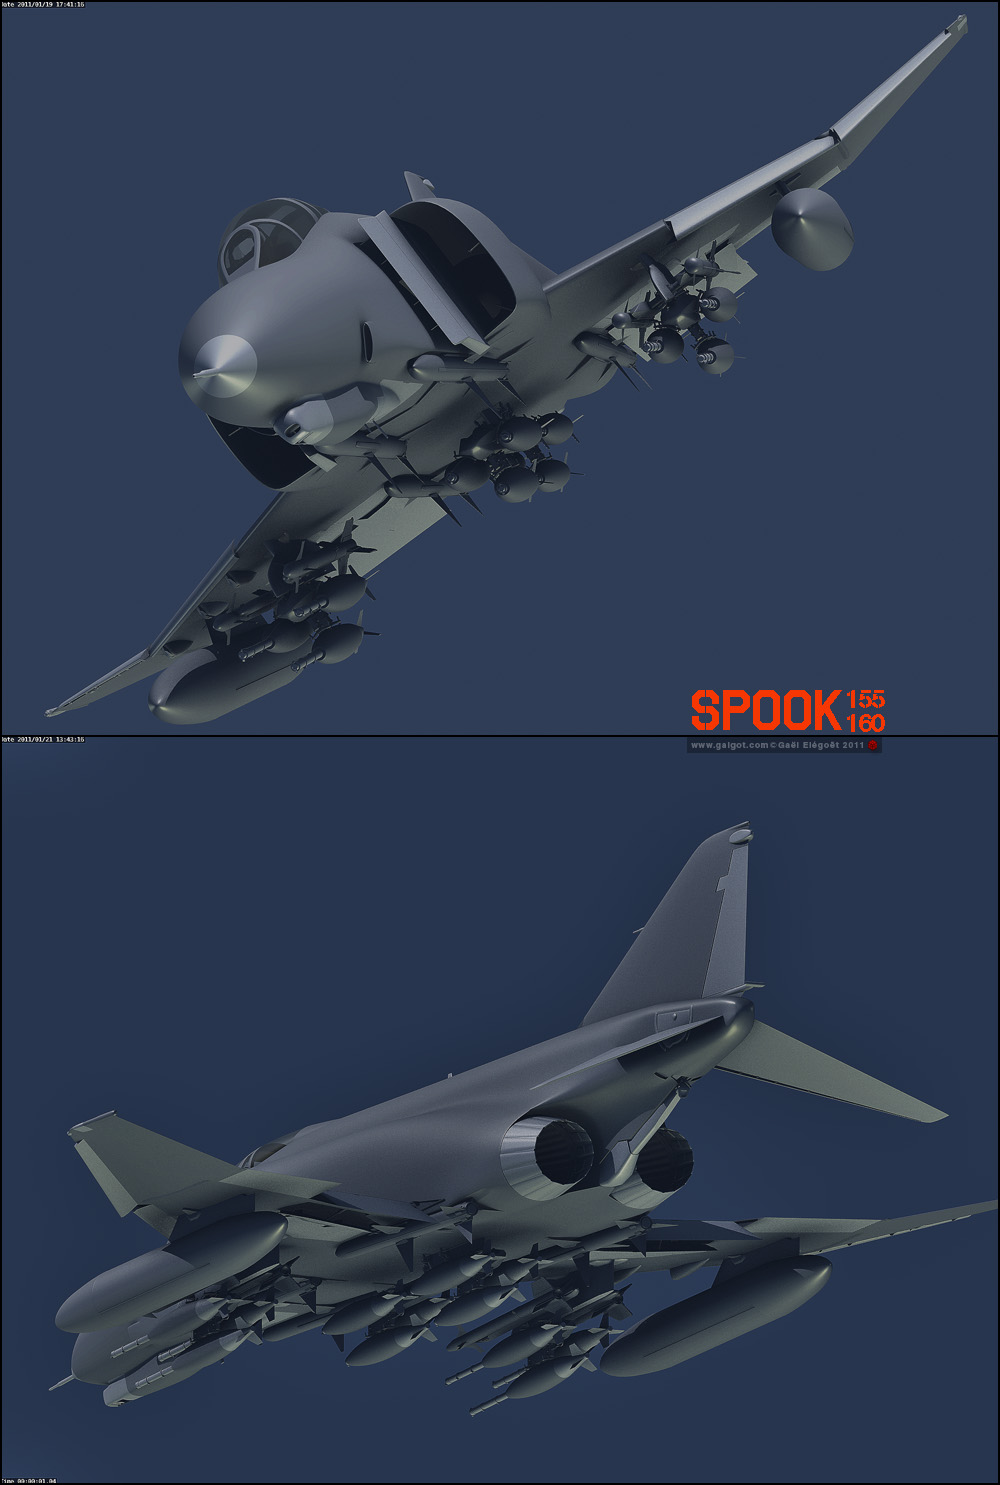 Spook155-160